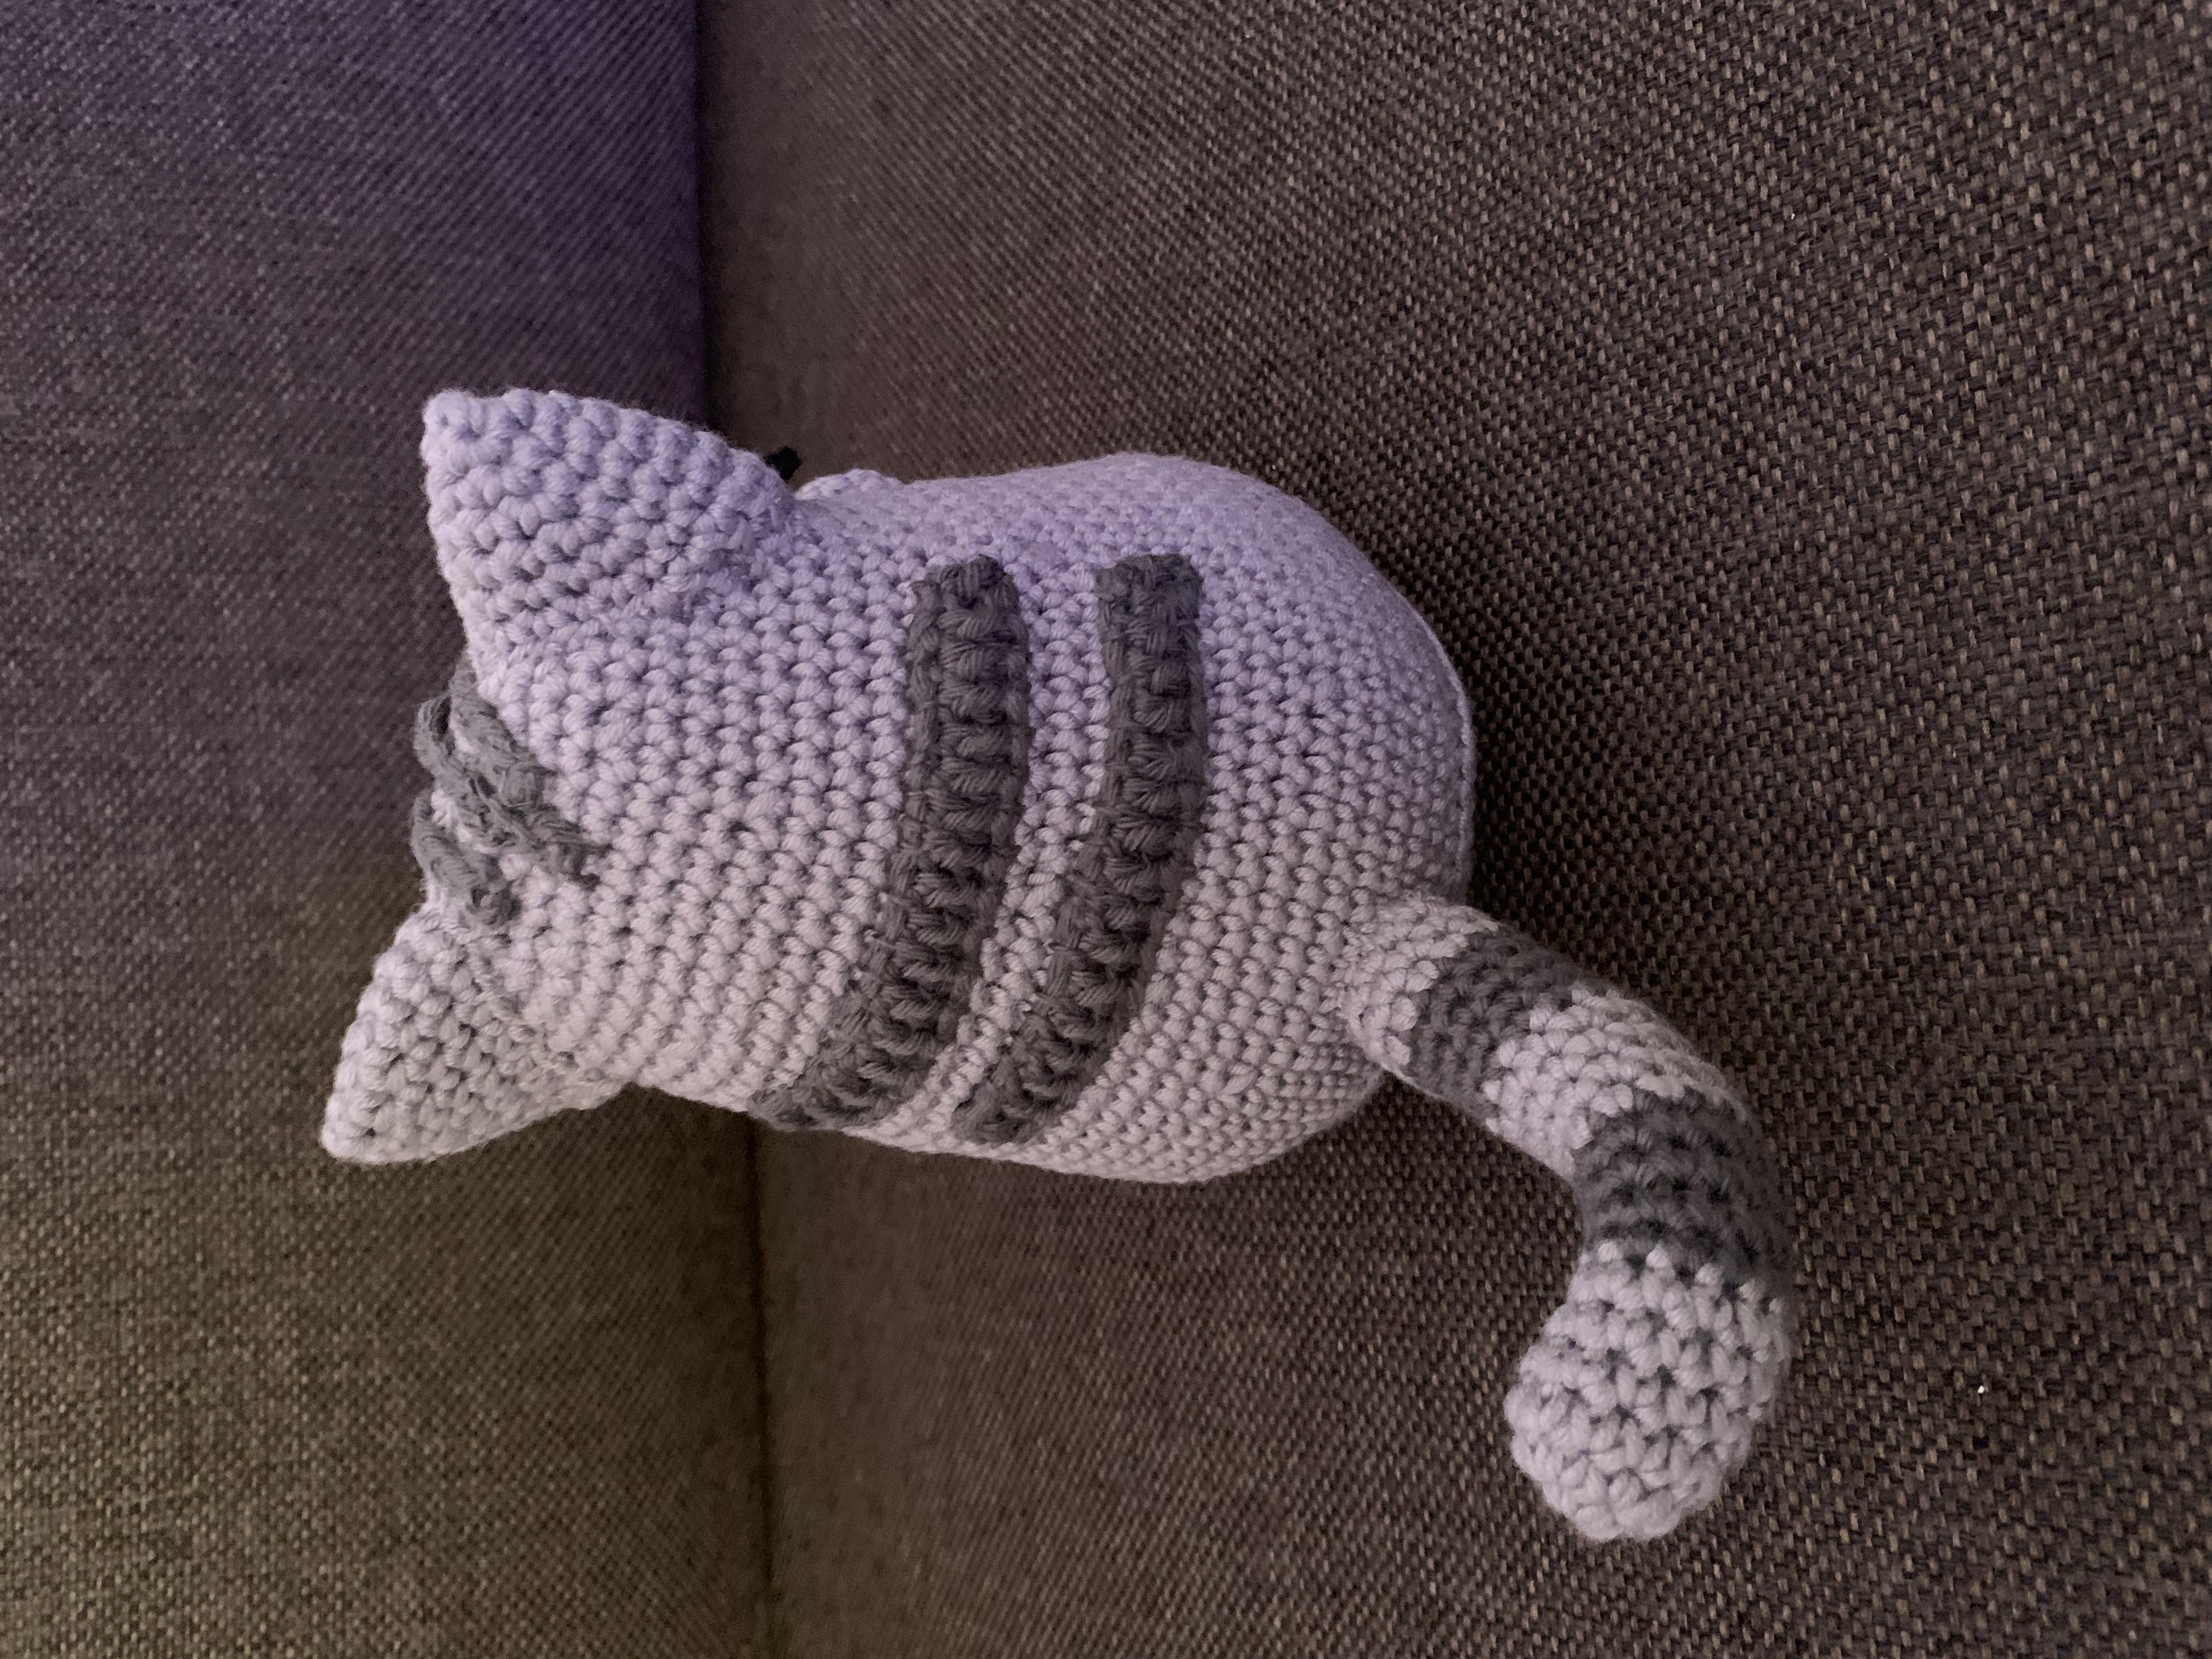 Pastel pusheen Amigurumi pattern - A little love everyday! | 3024x4032